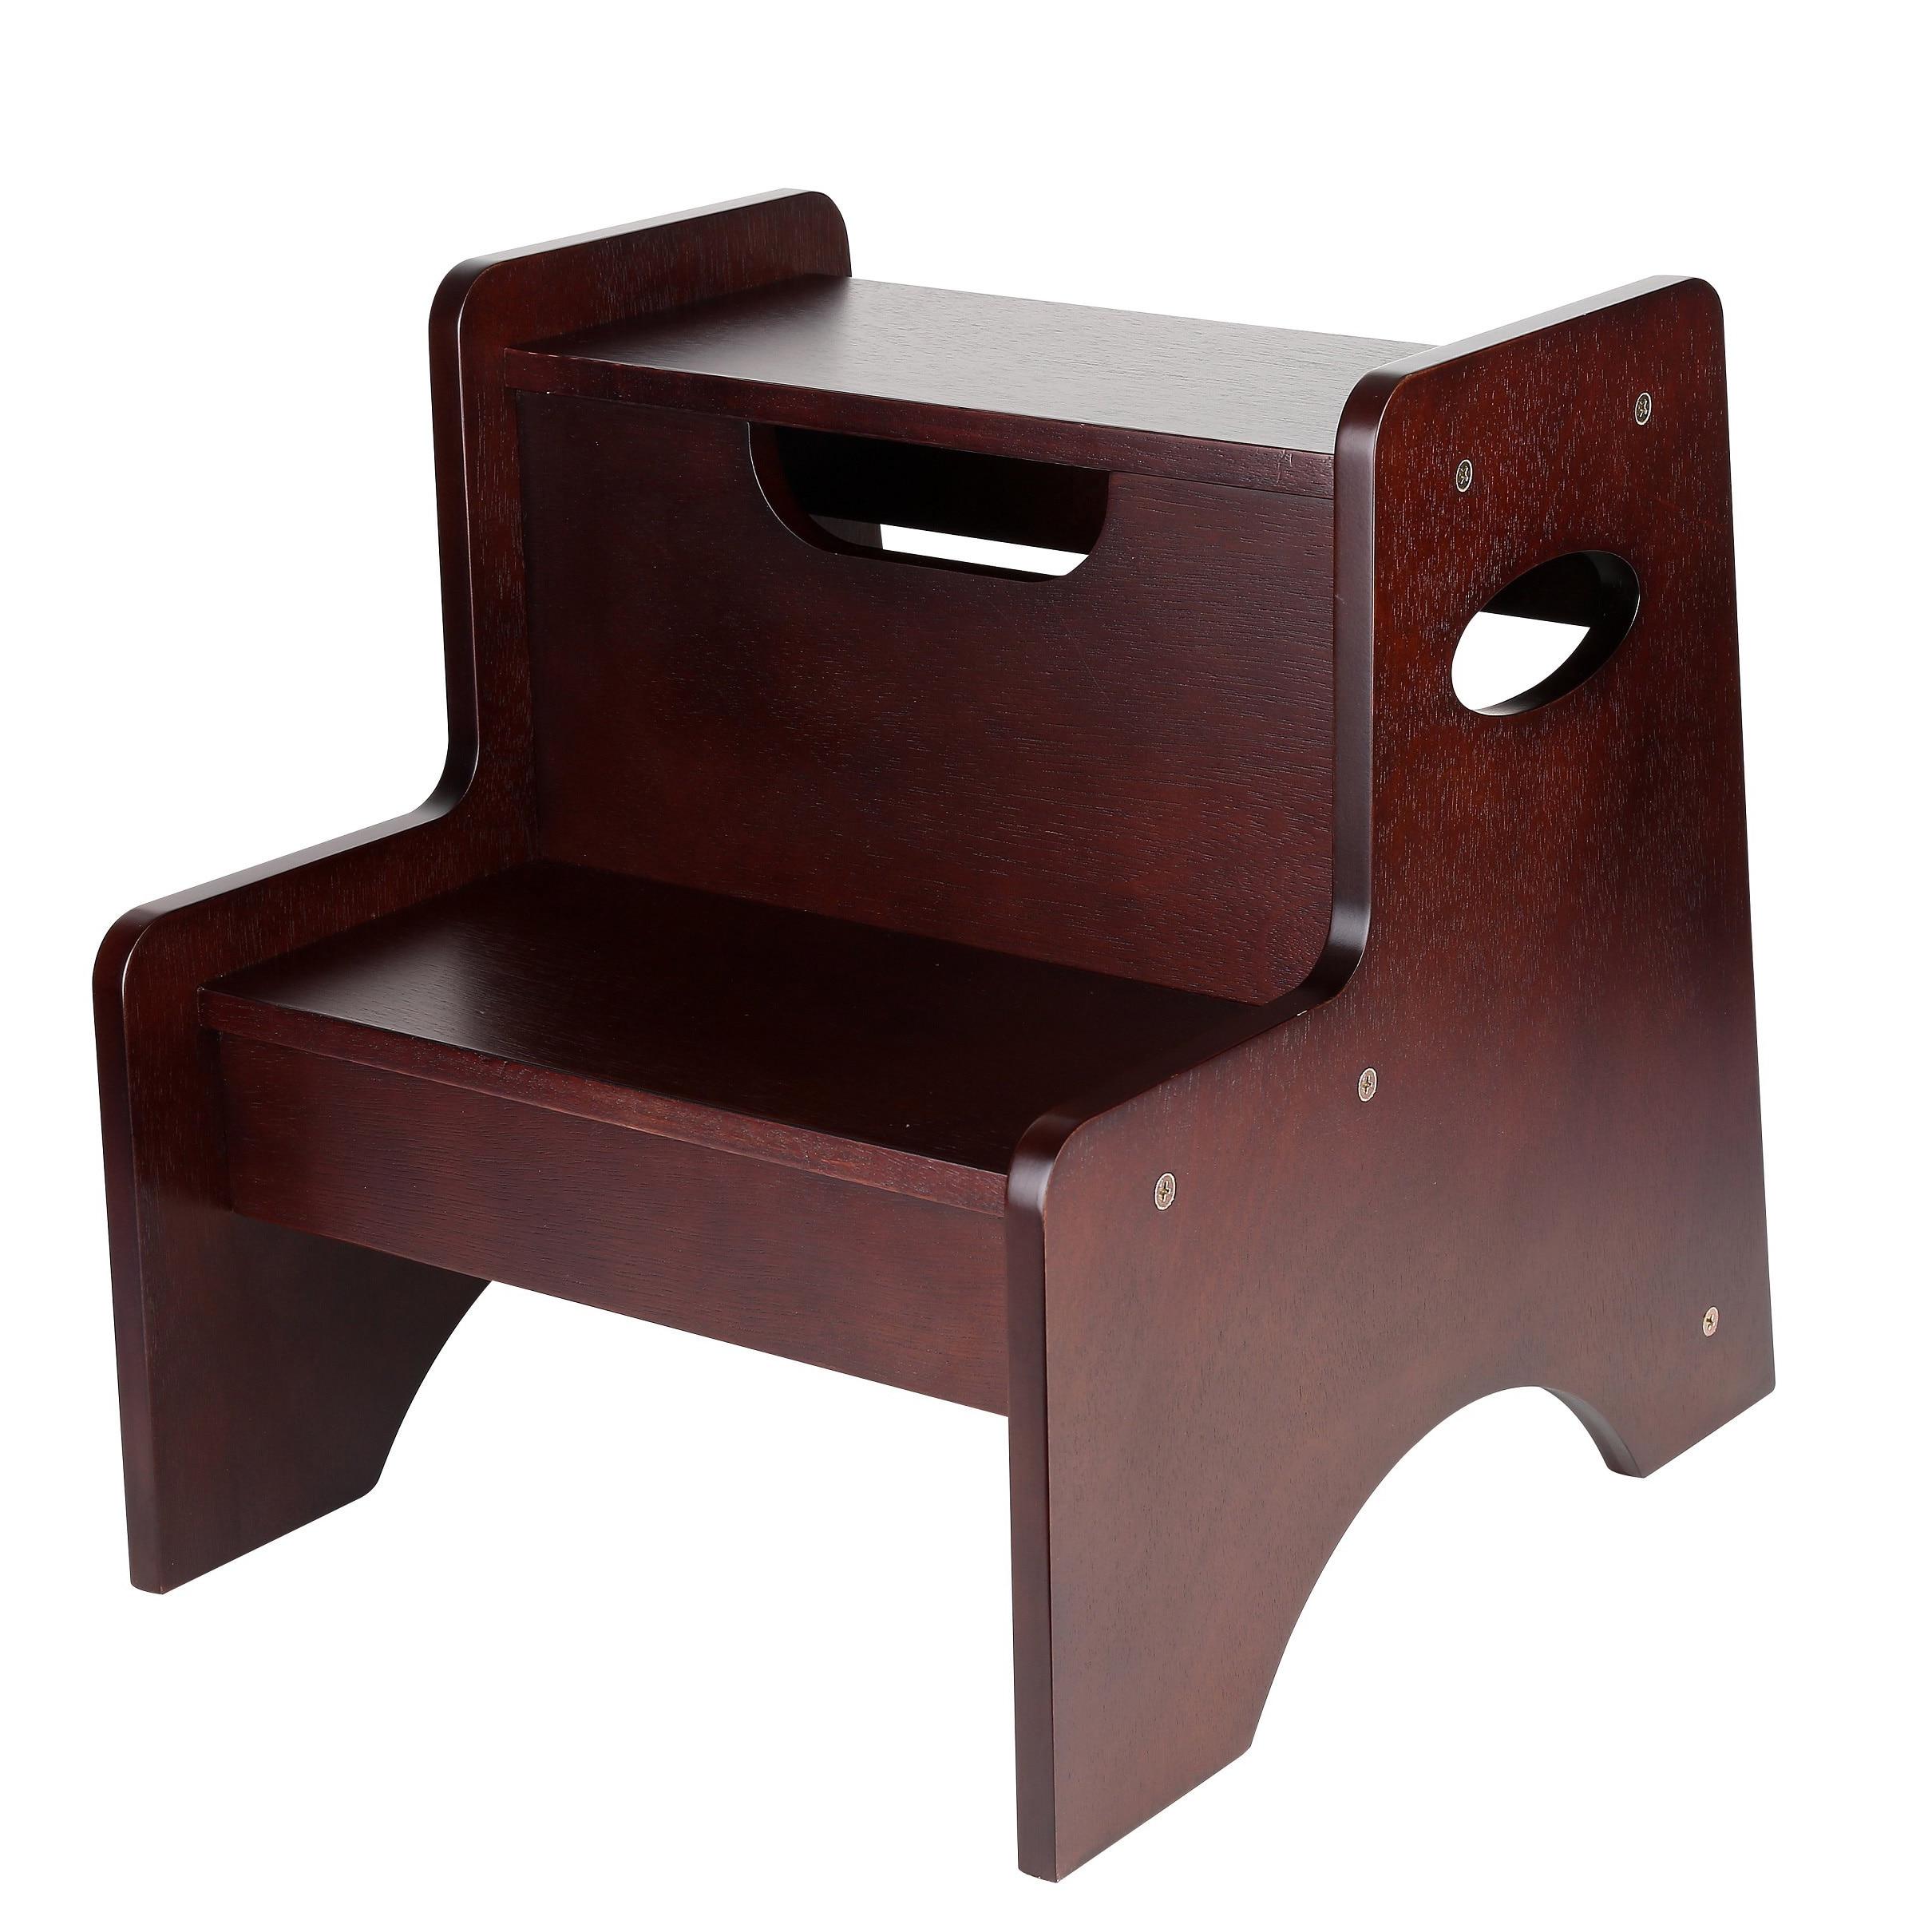 Astonishing Levels Of Discovery Espresso Two Step Stool Creativecarmelina Interior Chair Design Creativecarmelinacom